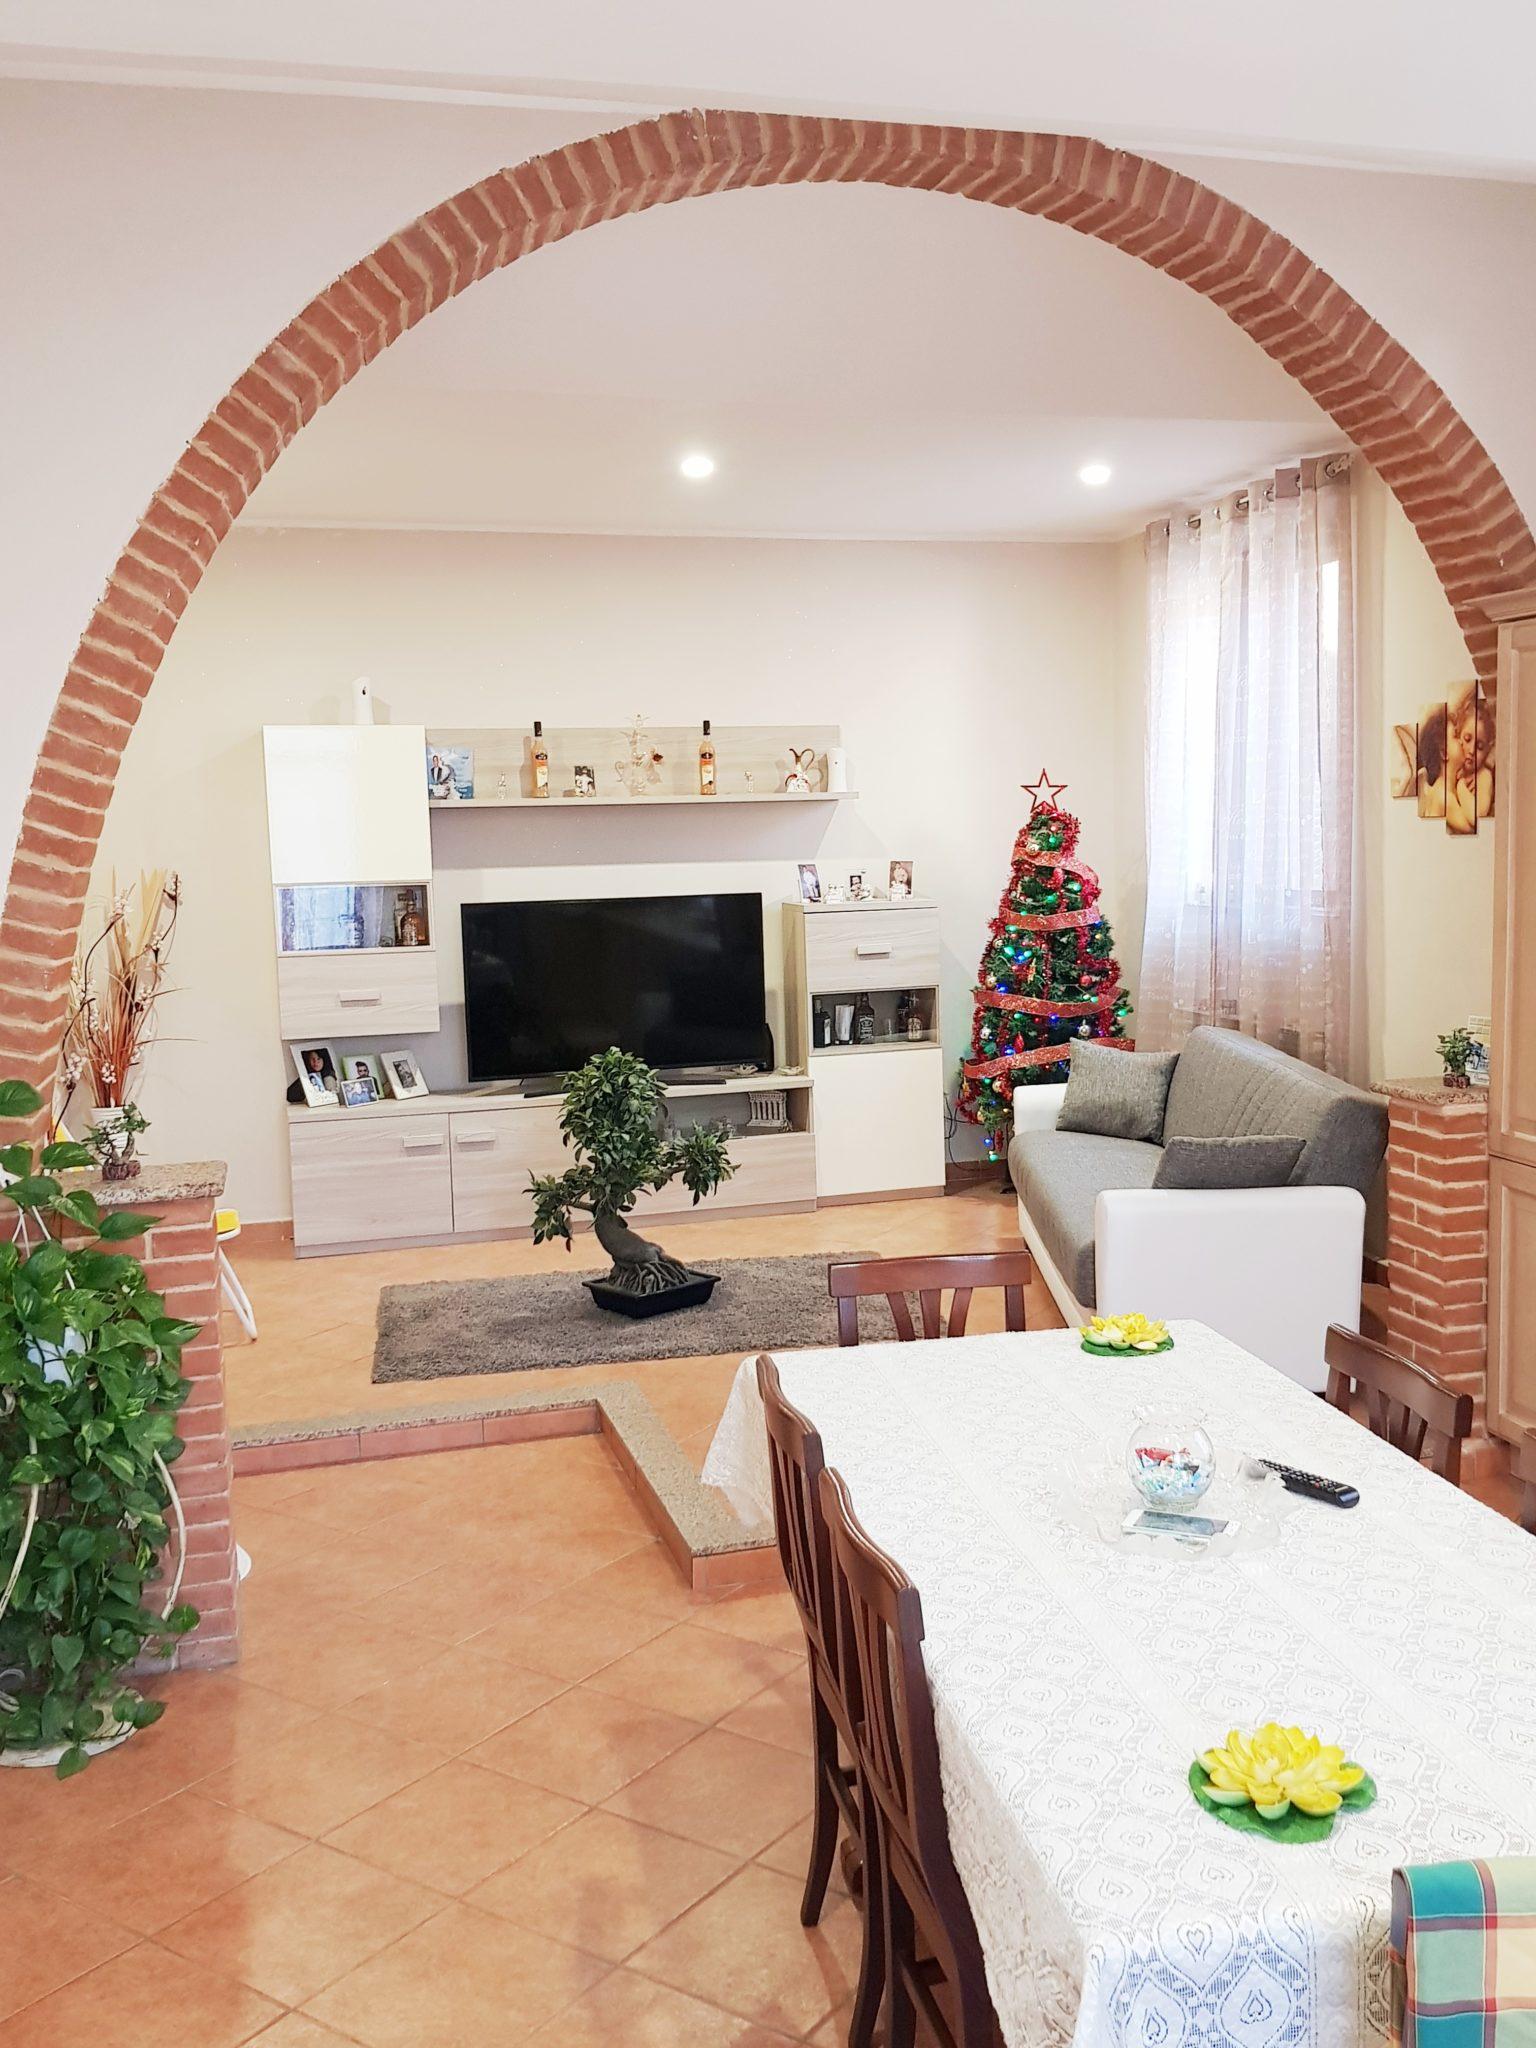 TRINO (VC) Via Gennaro – Vendesi appartamento mq. 90